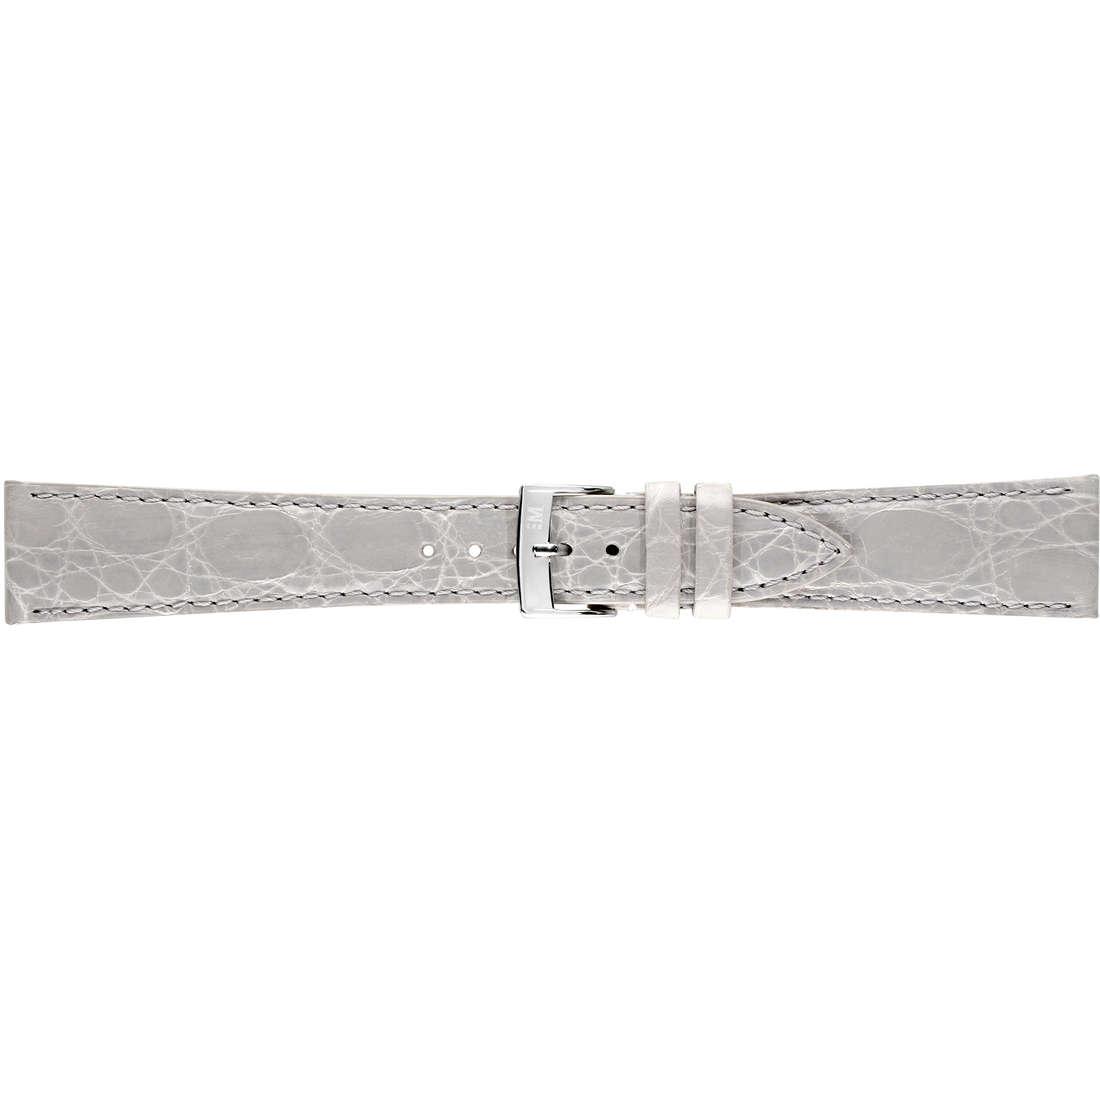 watch watch bands watch straps man Morellato Pelli Preziose A01X2197052093CR18